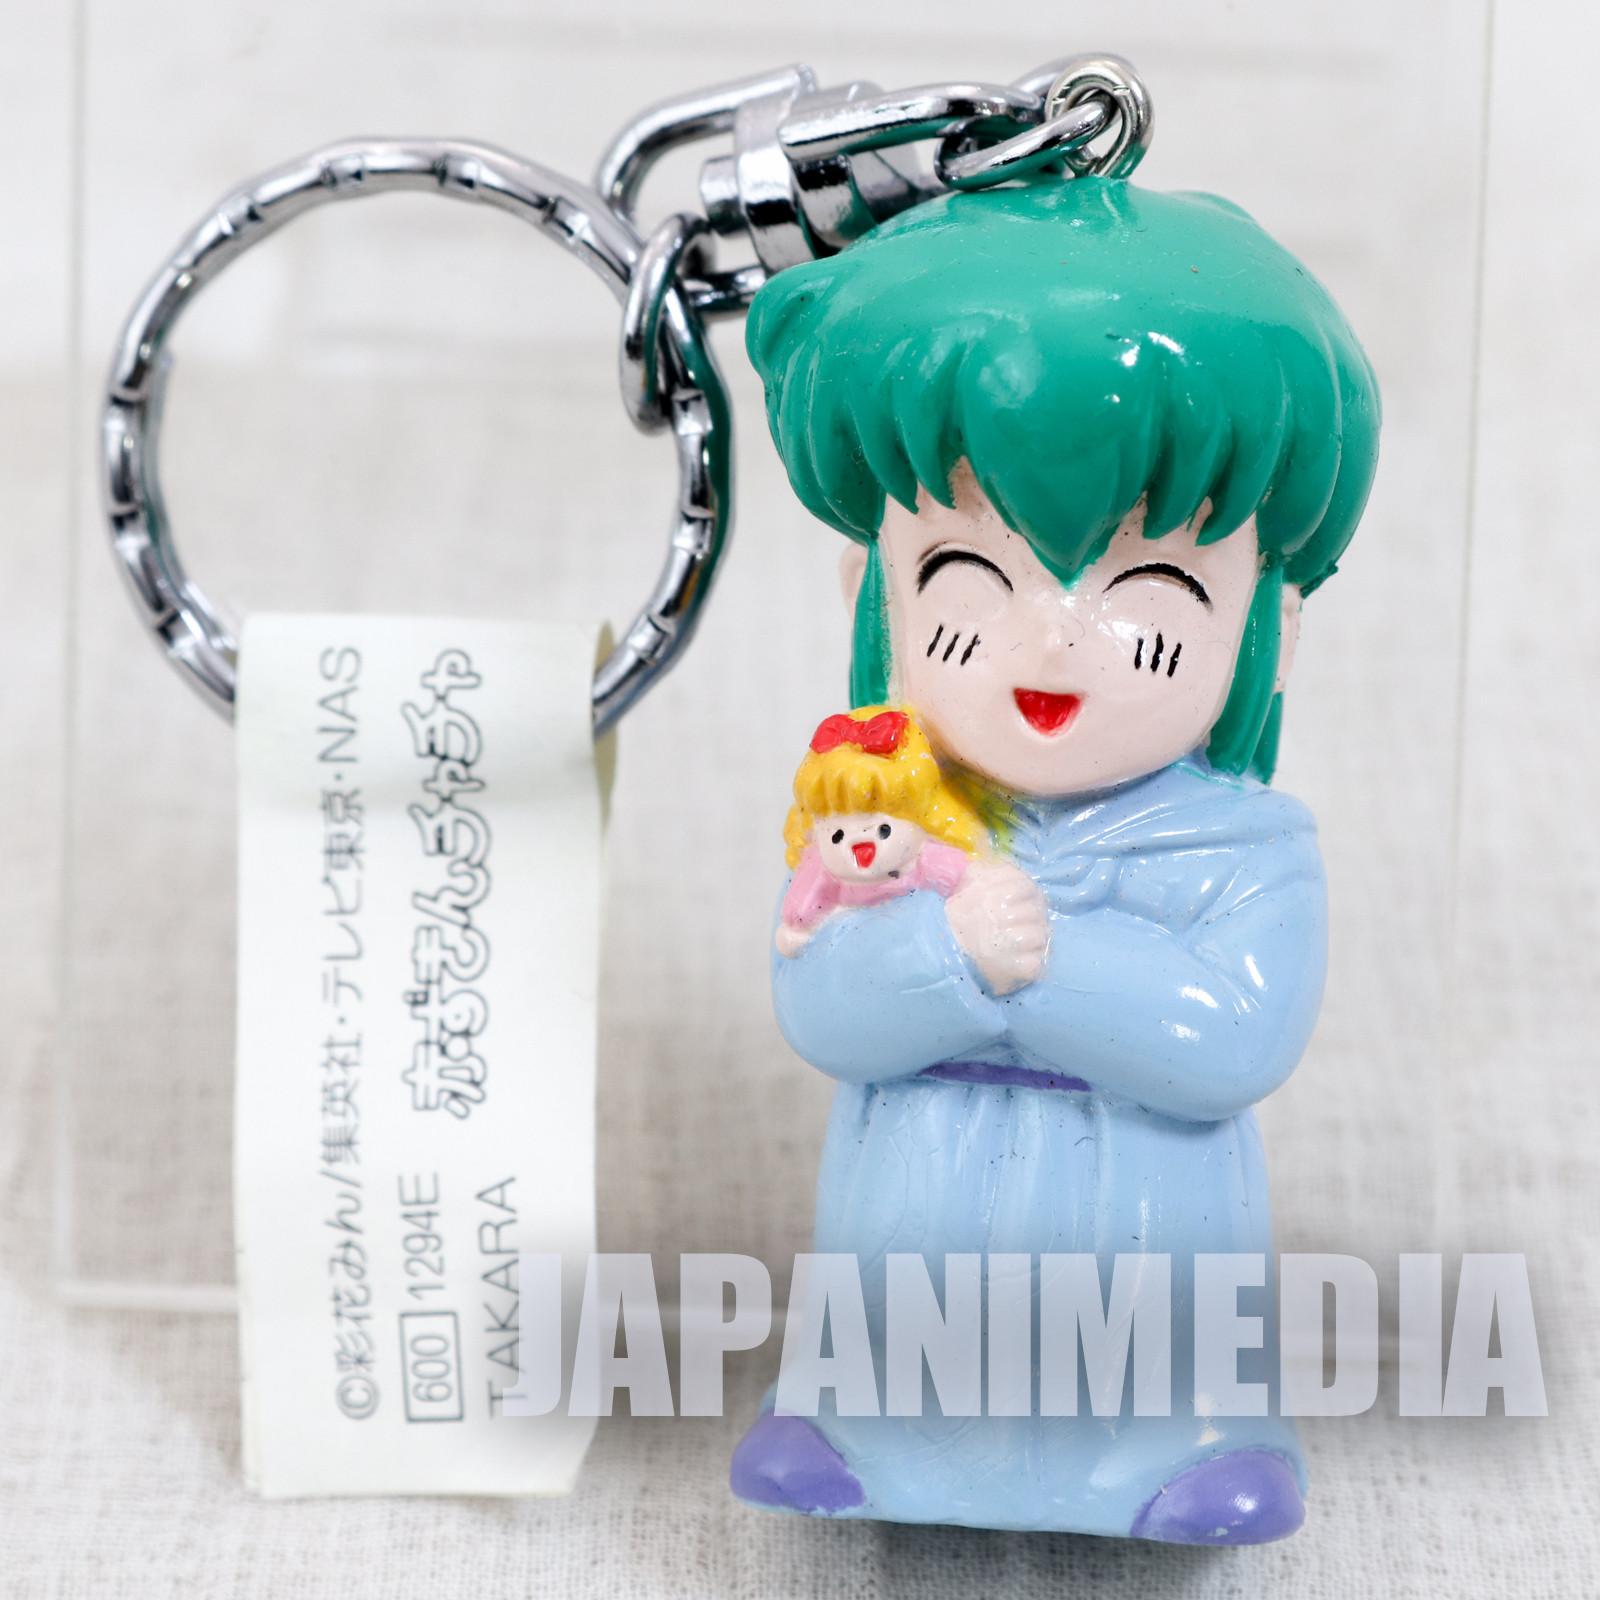 Akazukin Chacha Seravy Figure Keychain JAPAN ANIME